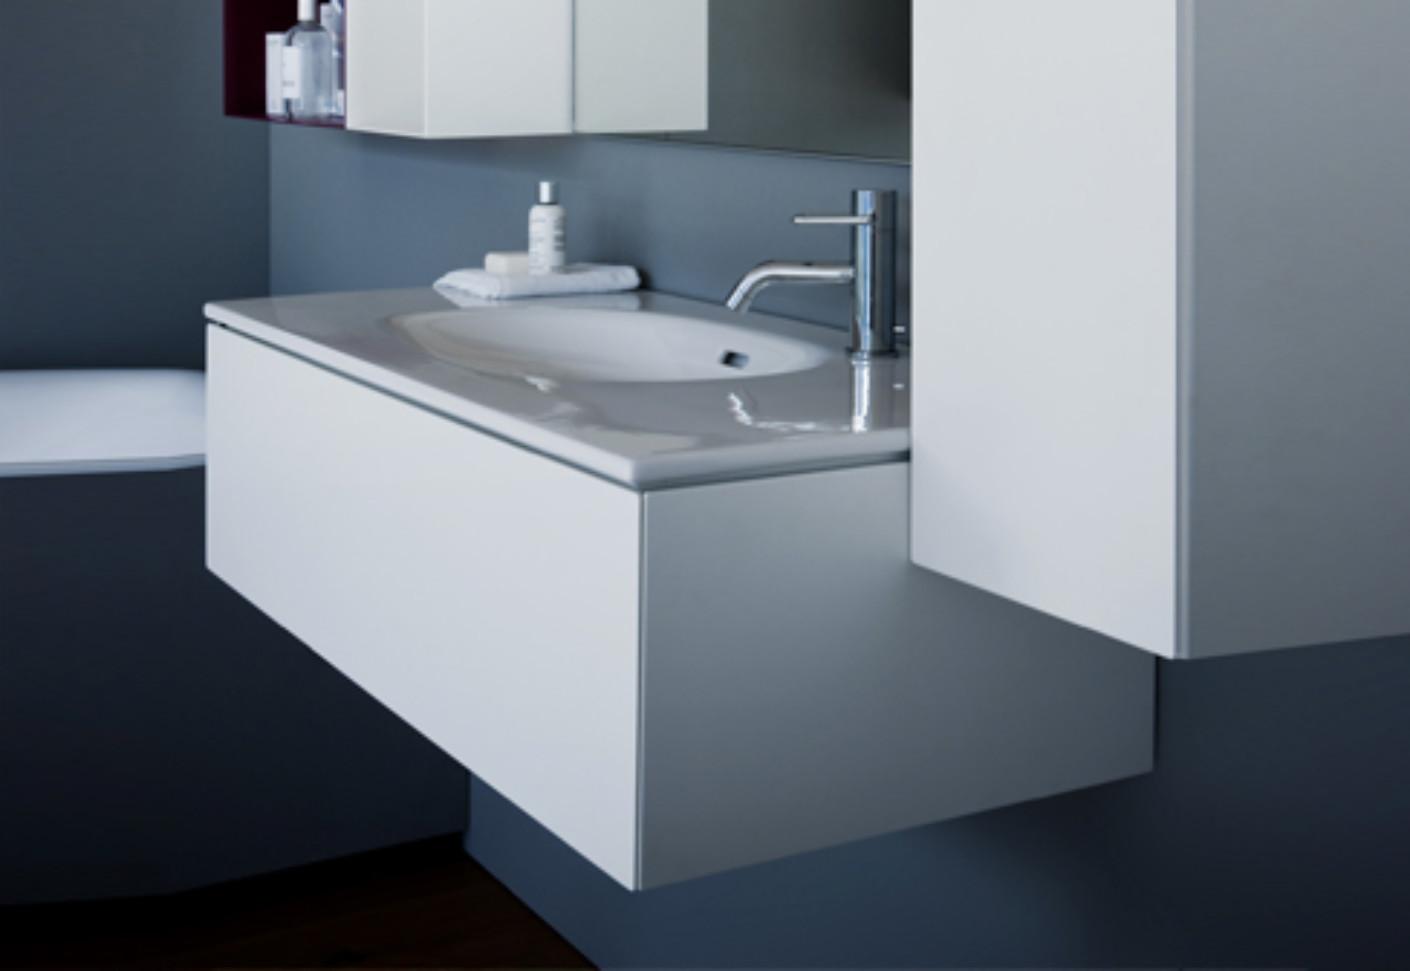 Palomba Countertop Washbasin By Laufen Stylepark